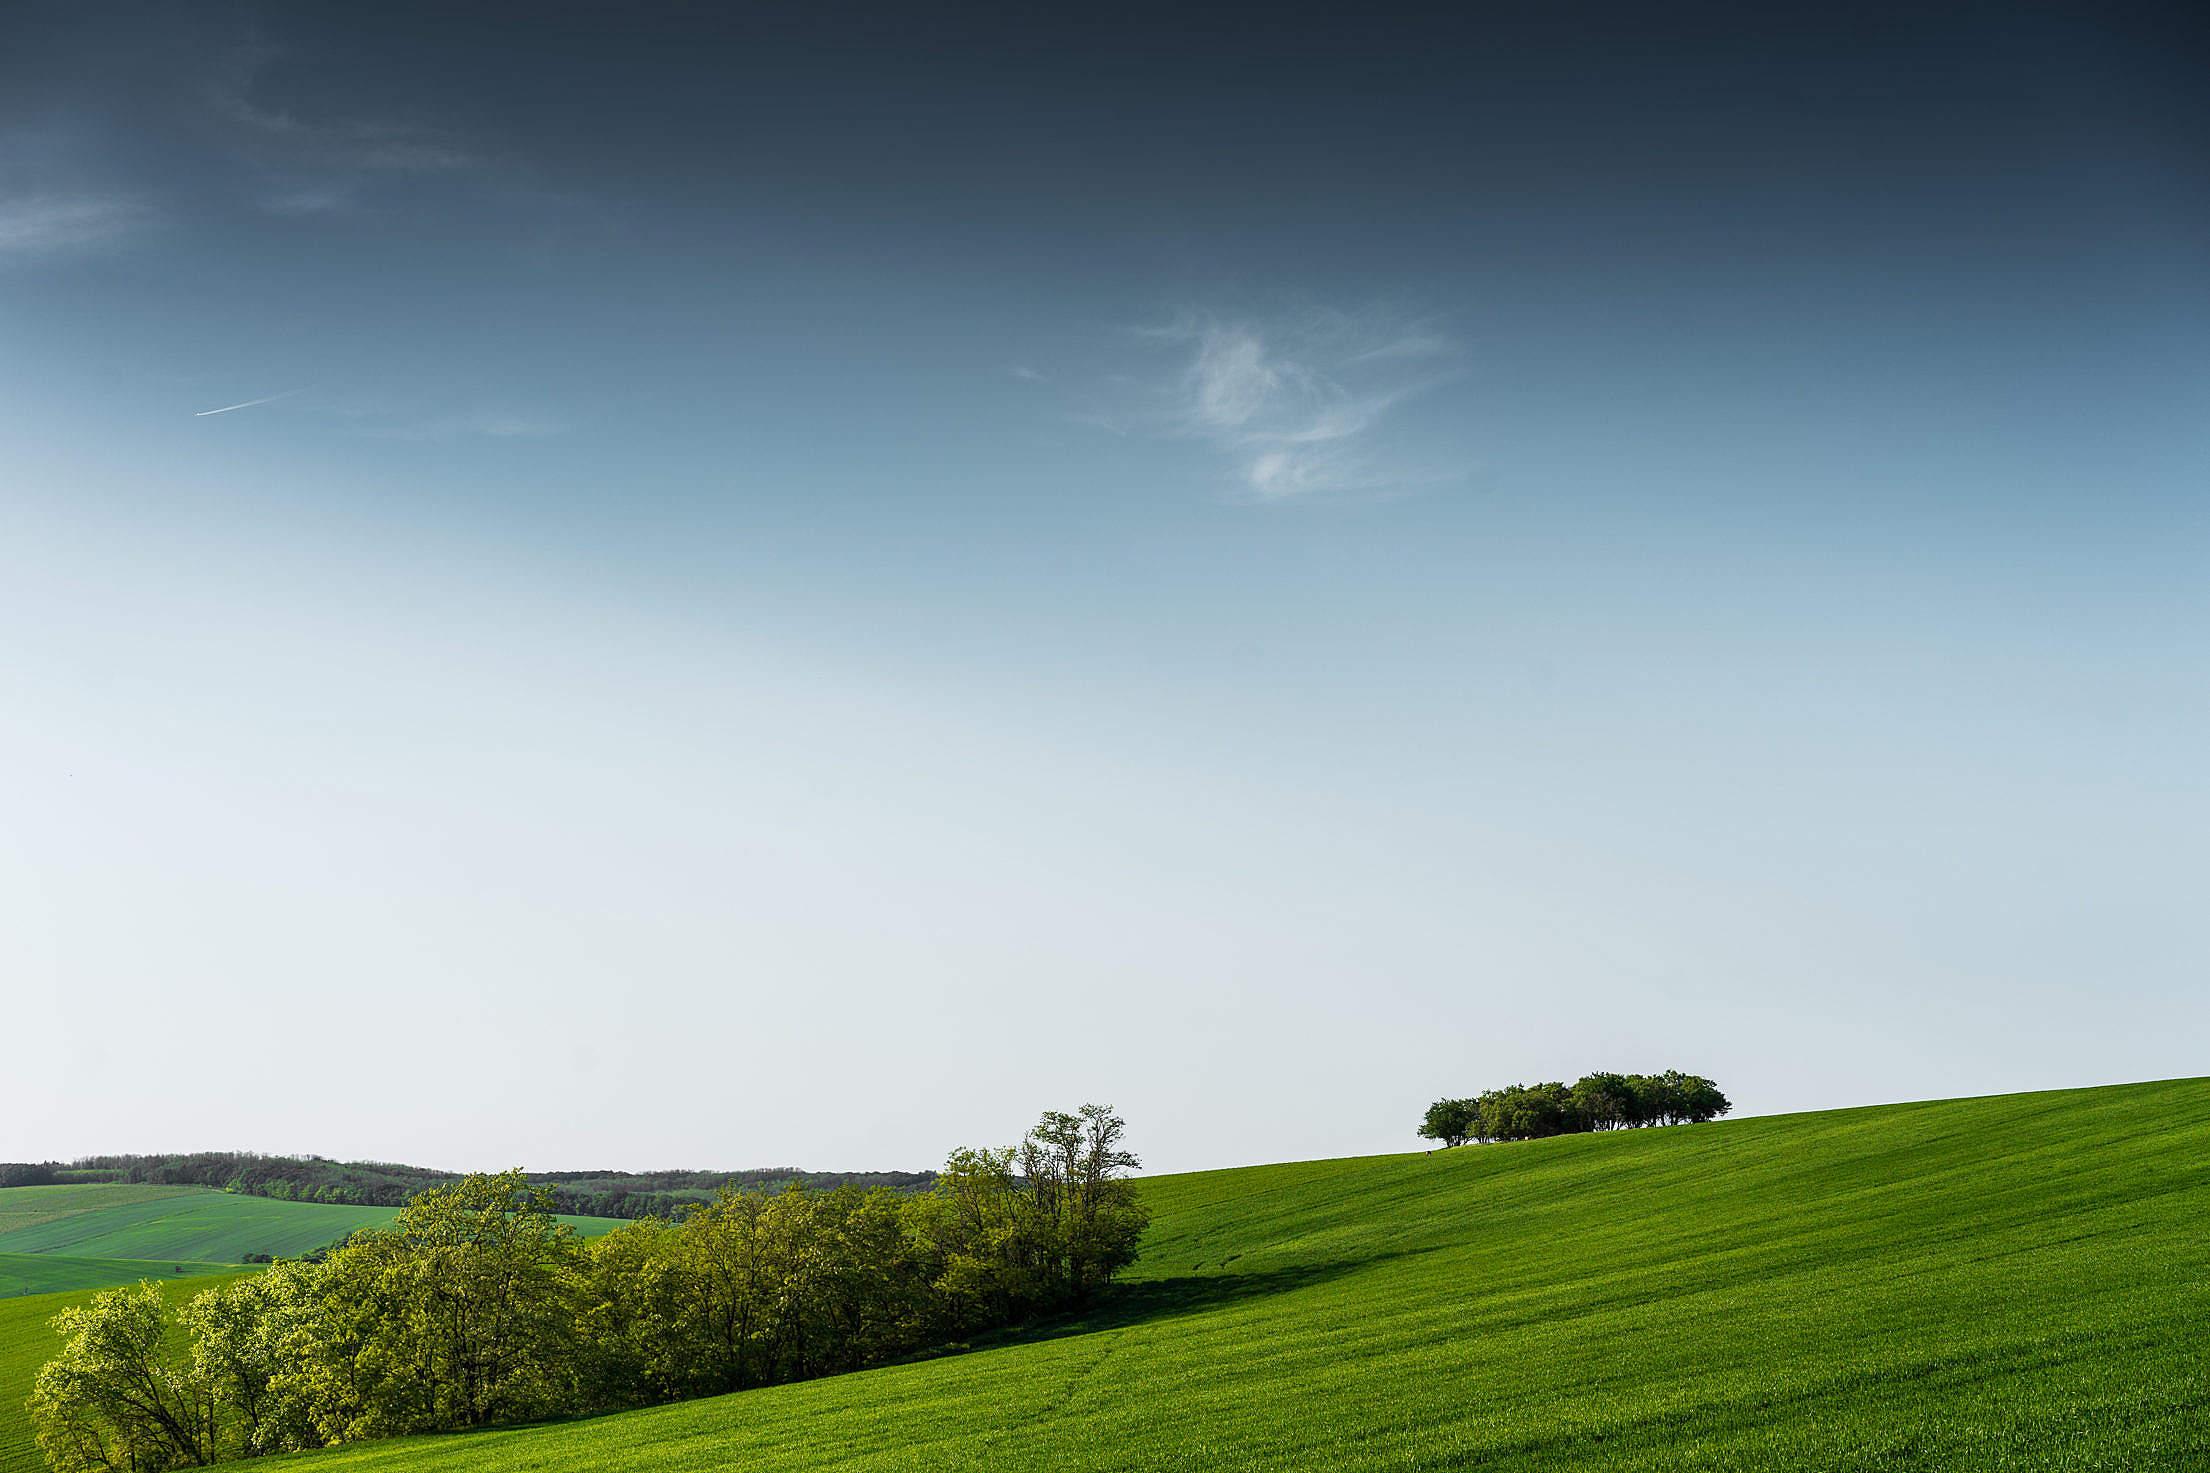 Minimalistic Green Scenery with Blue Sky Free Stock Photo